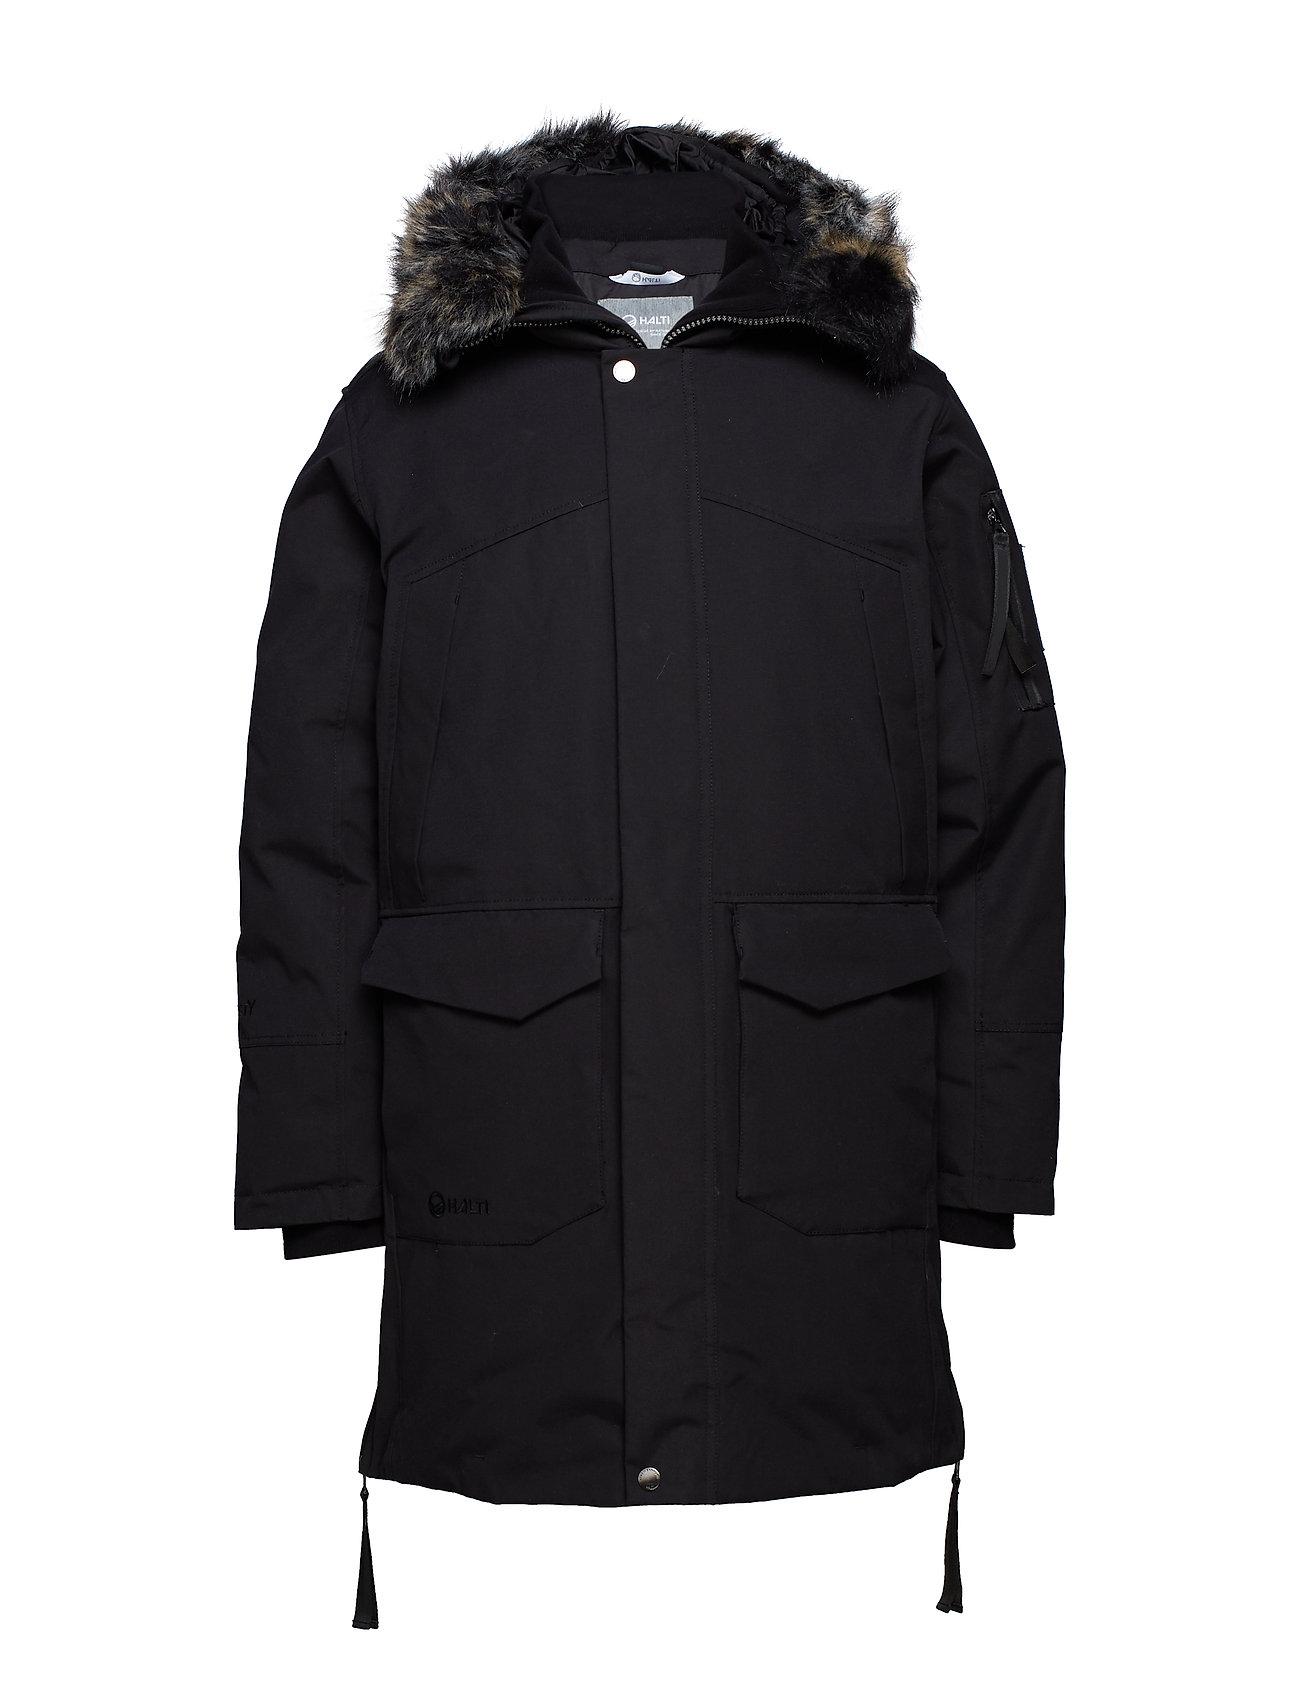 Halti Osaka M parka jacket - BLACK